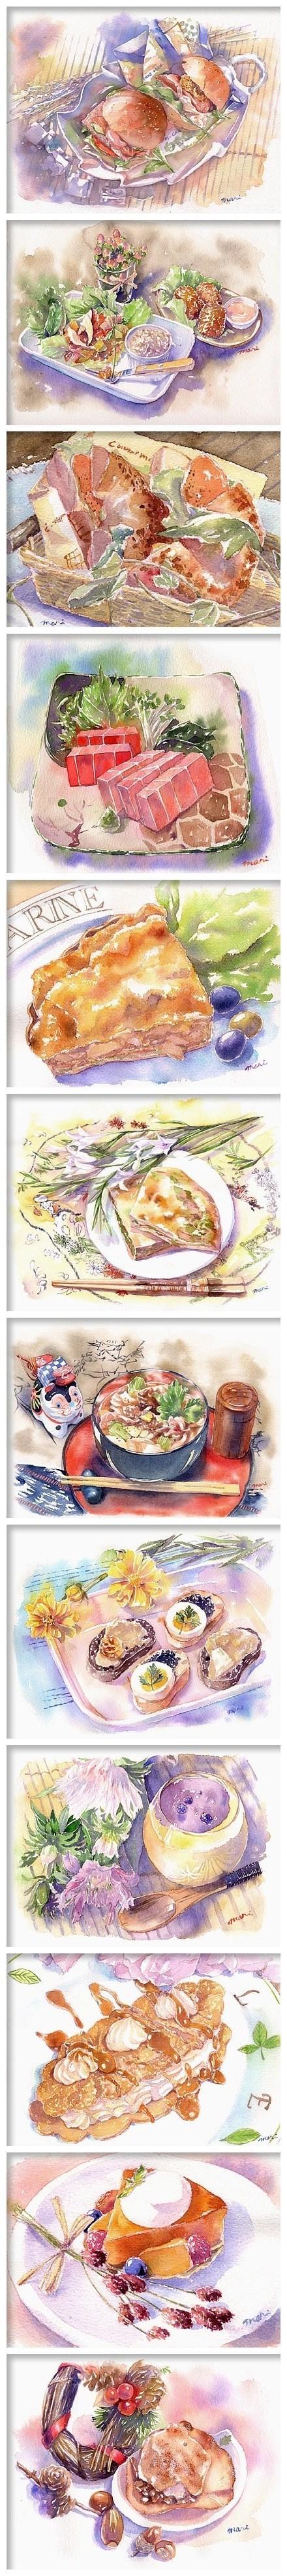 food watercolor